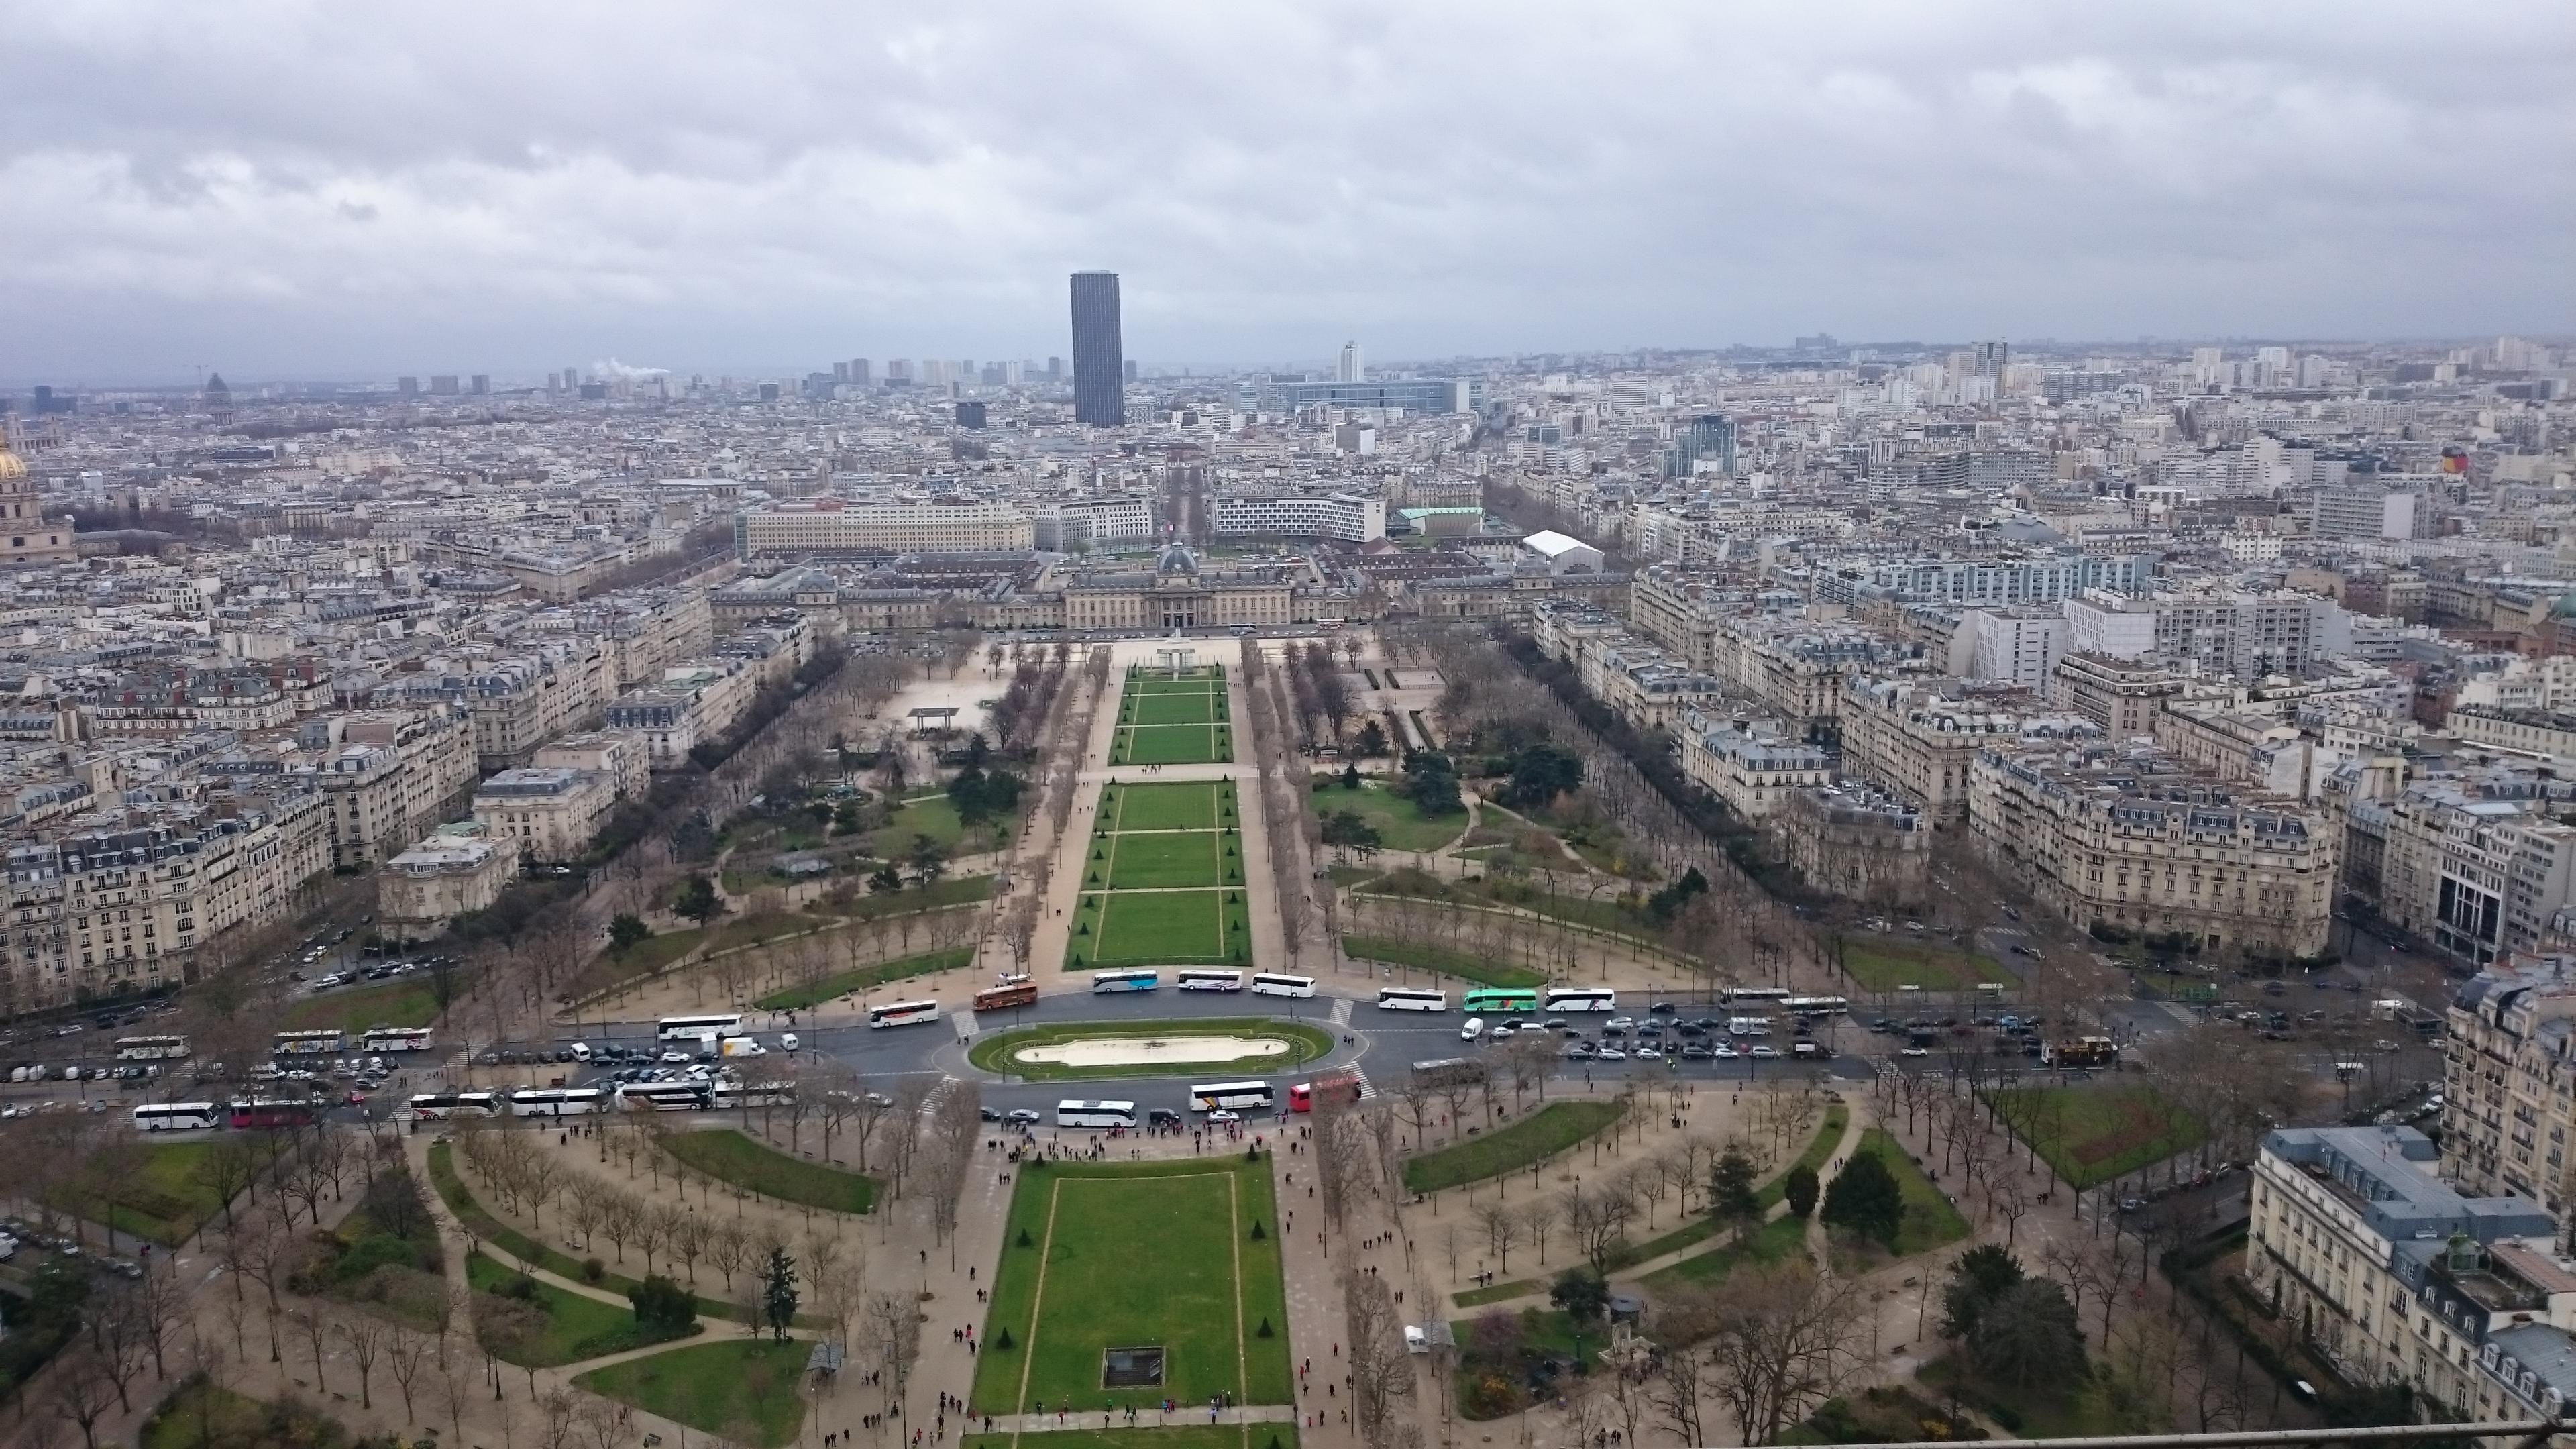 DSC 1946 - Visitando la Torre Eiffel en Paris